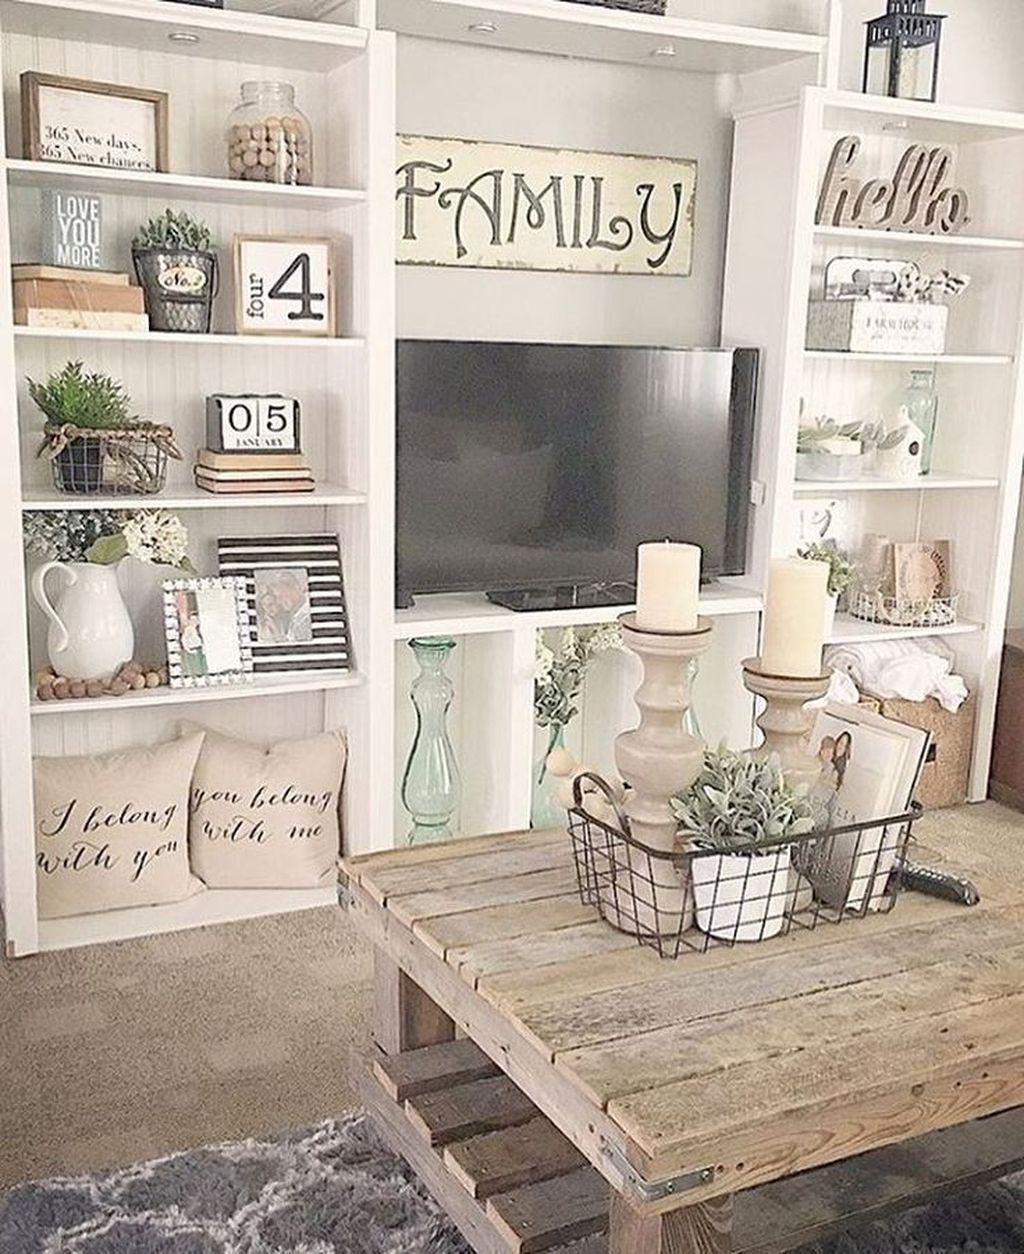 88 Cozy Farmhouse Bedroom Design Ideas That Inspire | Raumgestaltung ...